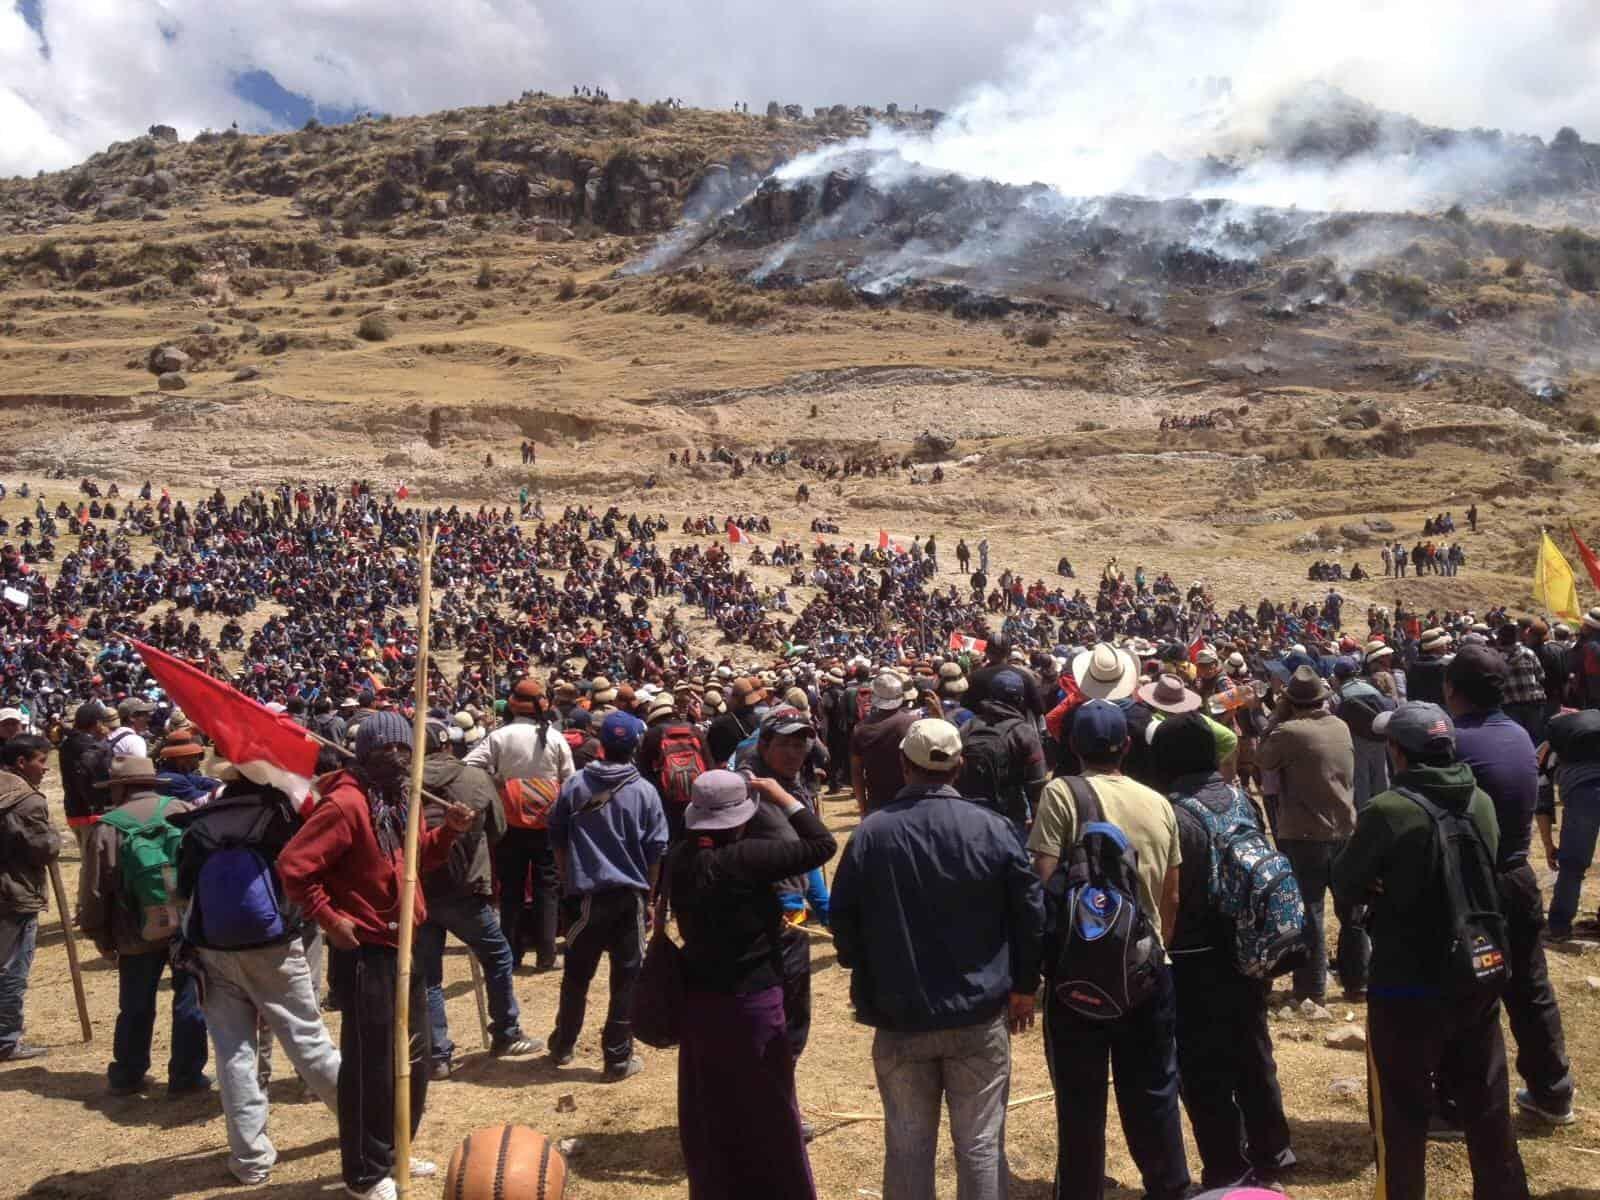 Protestors surround Las Bambas mine in Peru